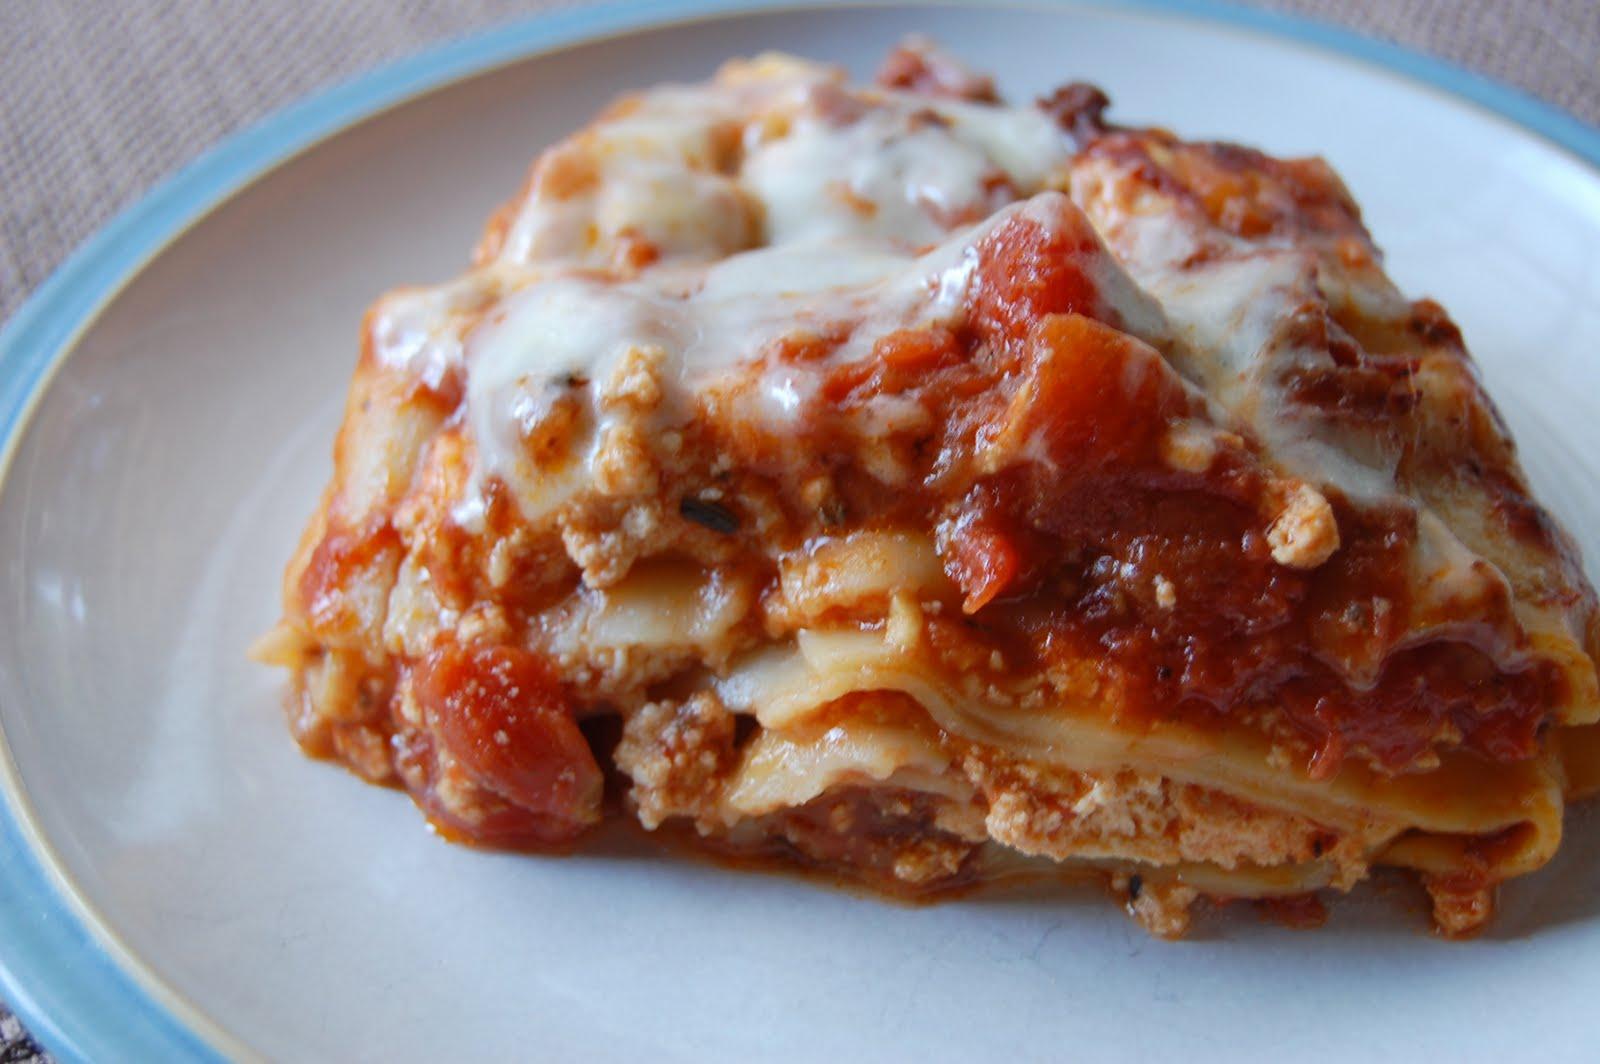 Dinner with Danielle: Crock Pot Lasagna {9 WW+ Dinner}